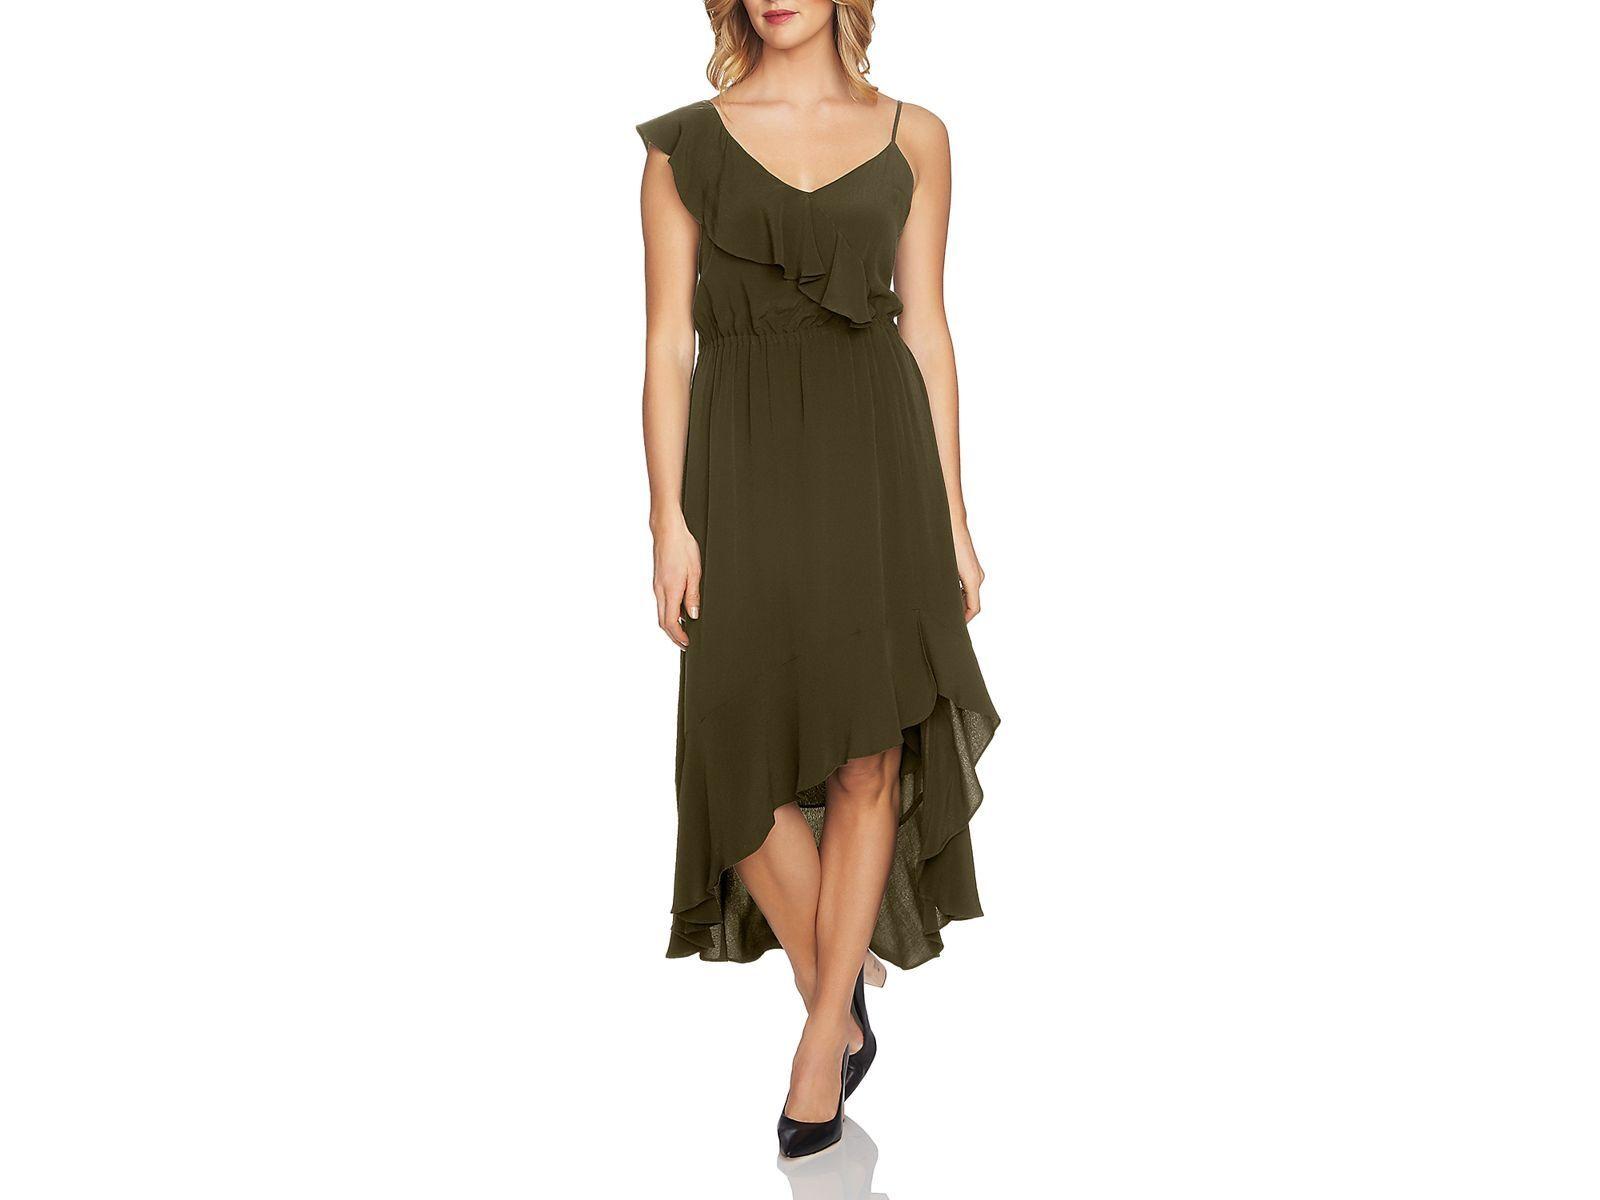 NEW  220 1. STATE Women's GREEN RUFFLED ASYMMETRIC SLEEVELESS DRESS SIZE L